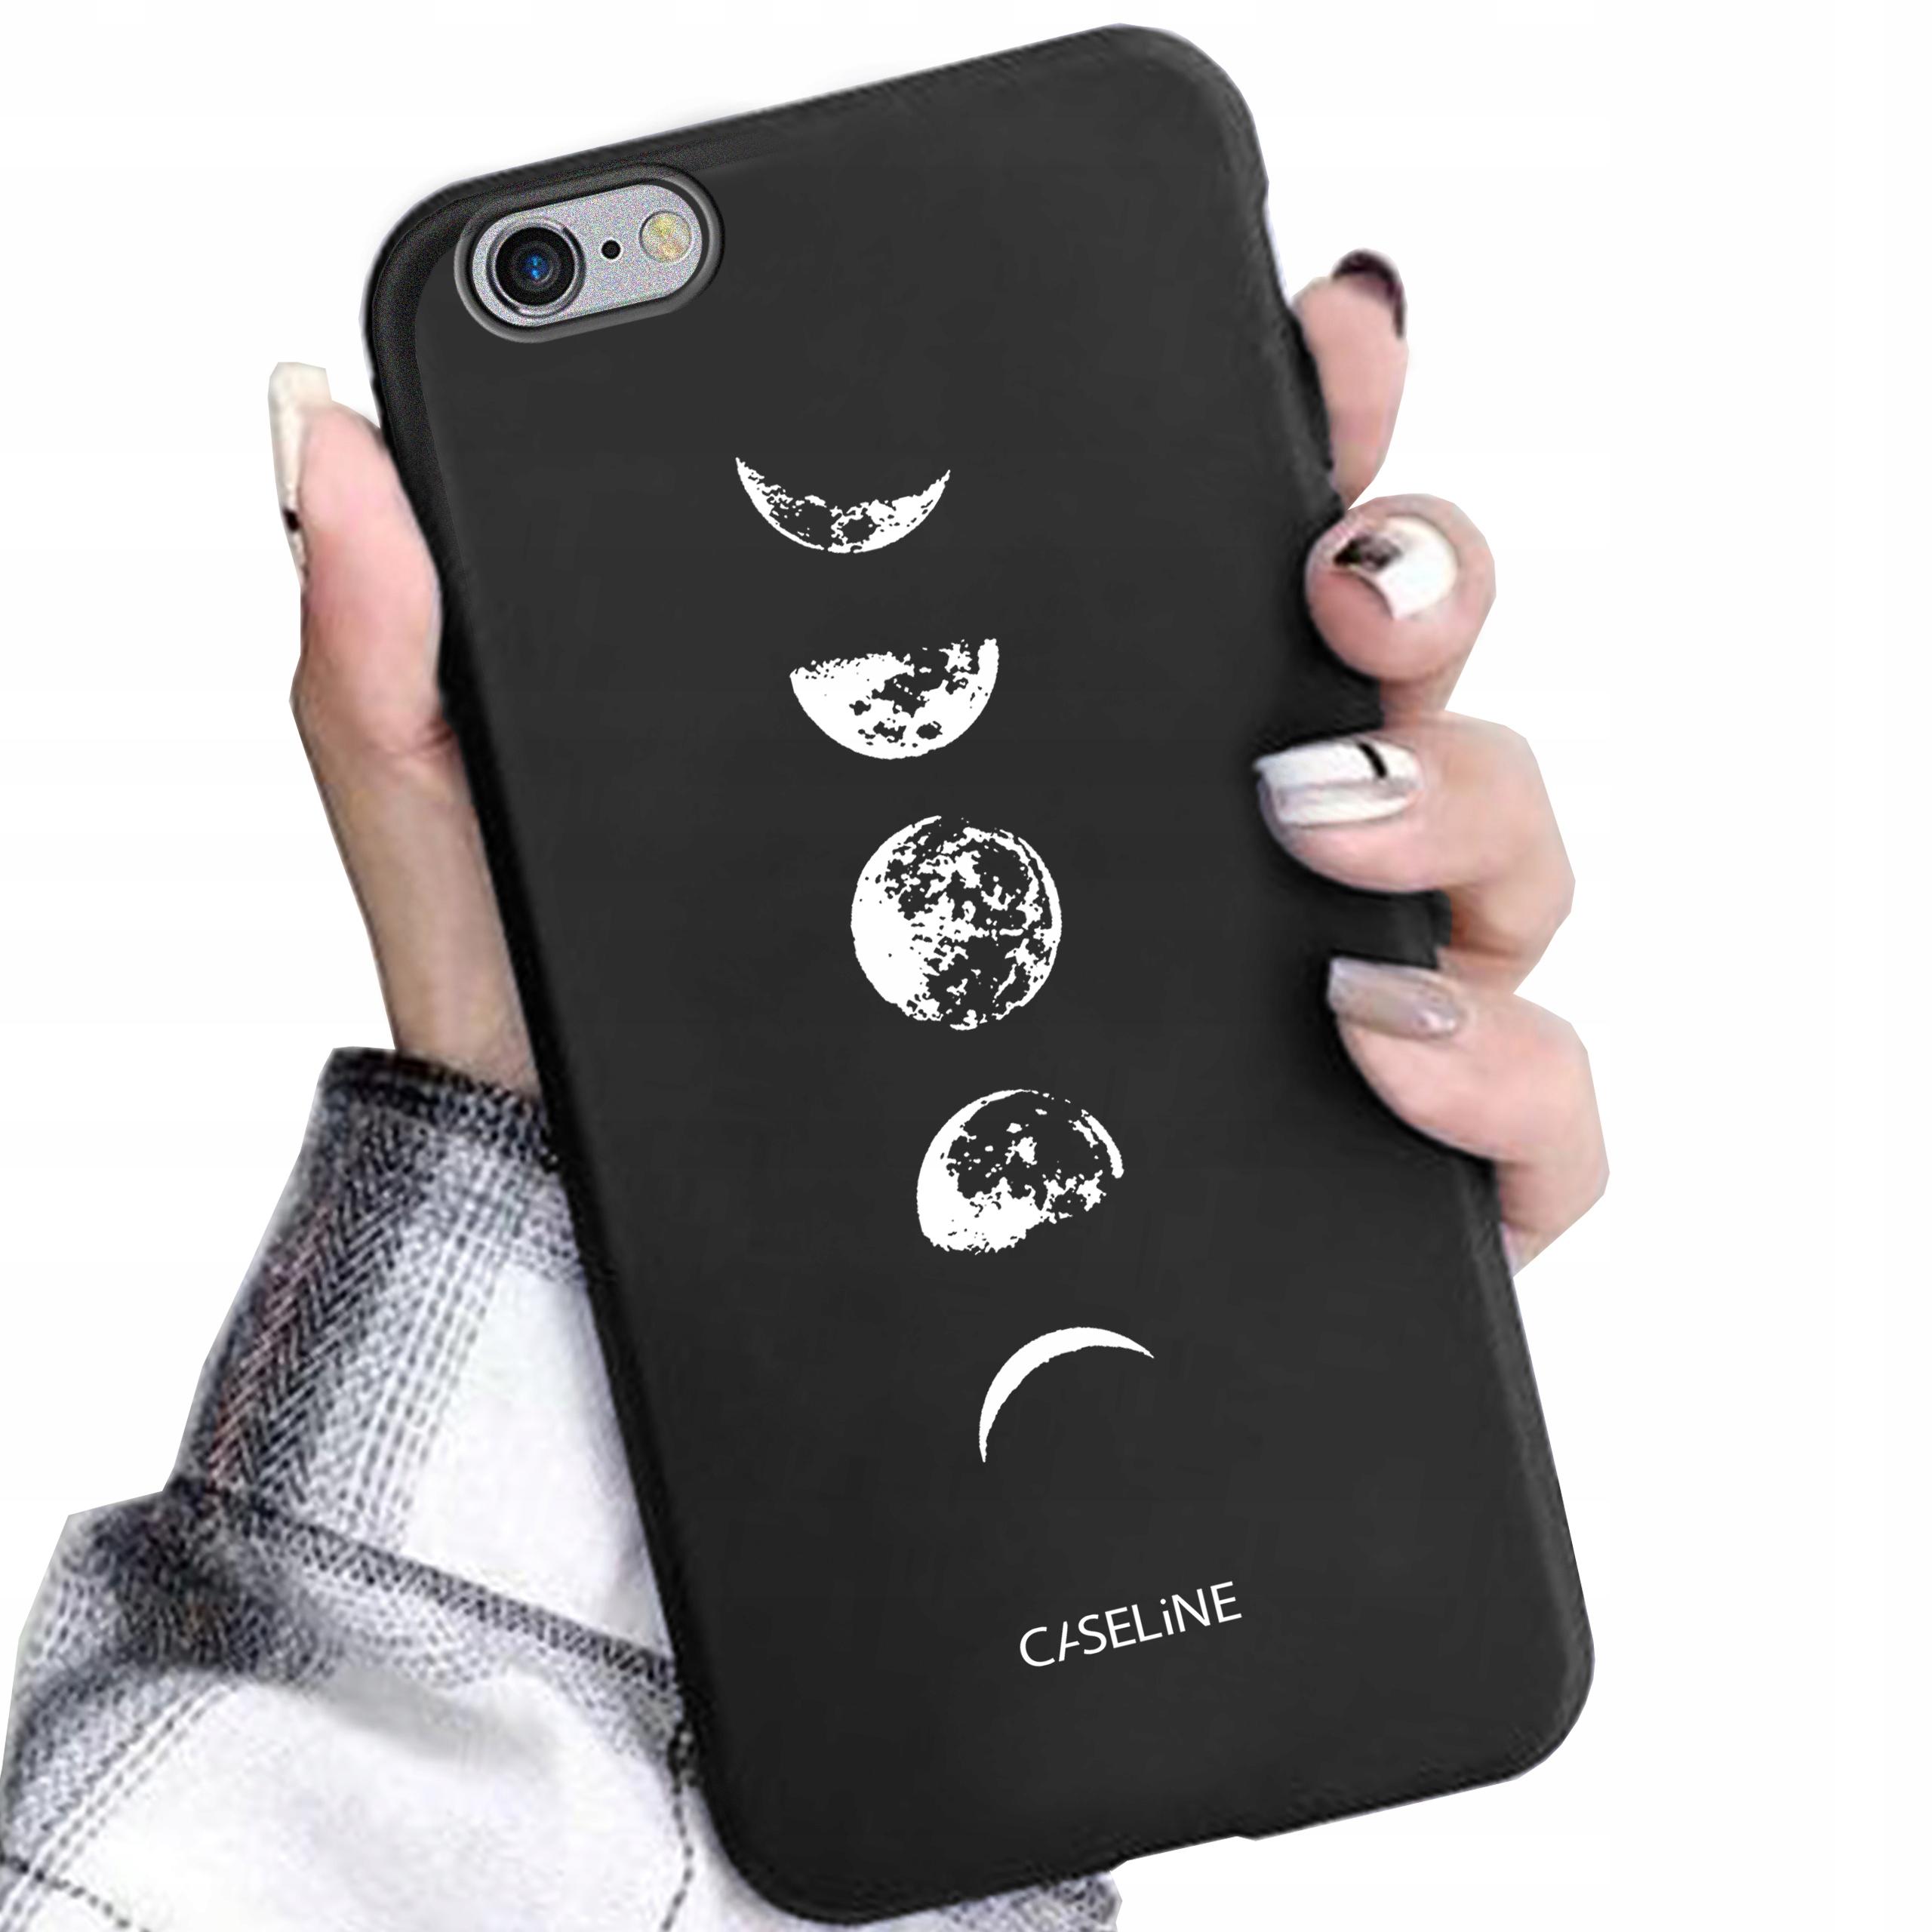 Etui Matowe Do Iphone 6 6s Case Guma Szklo 7617506926 Sklep Internetowy Agd Rtv Telefony Laptopy Allegro Pl